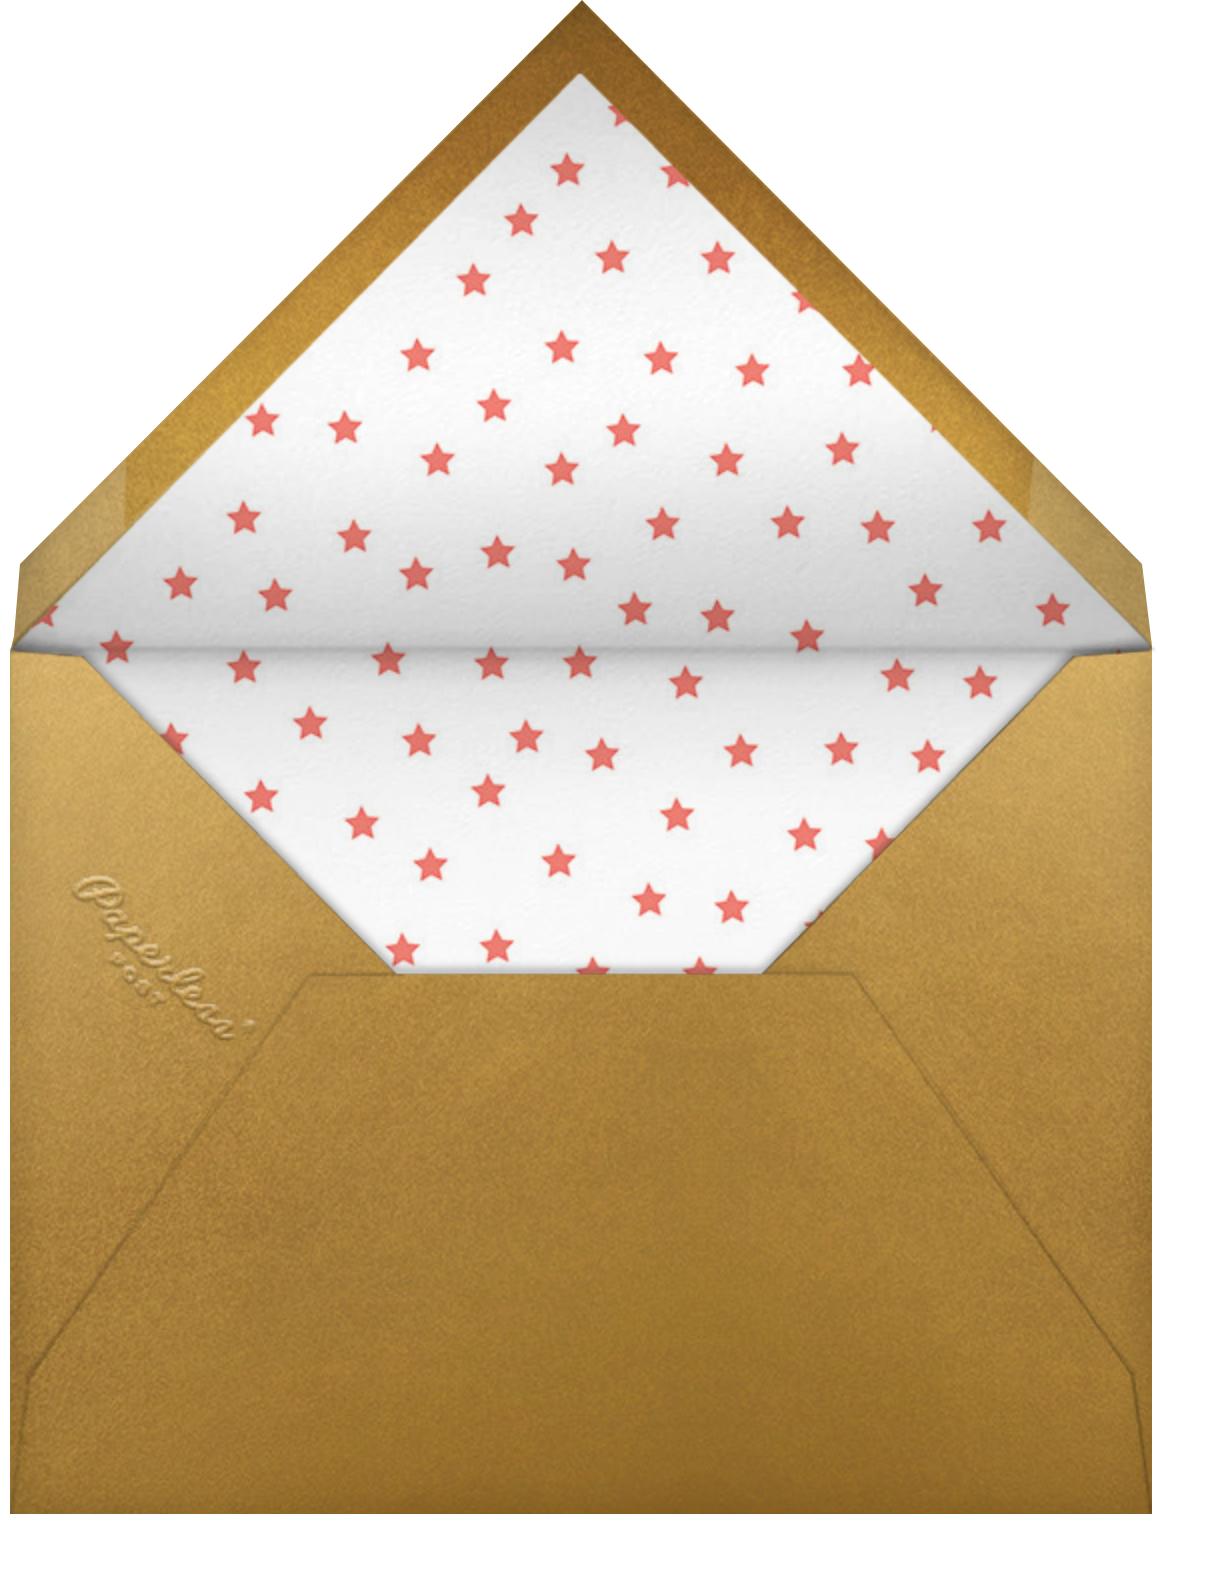 Joyful Stars - Little Cube - Envelope